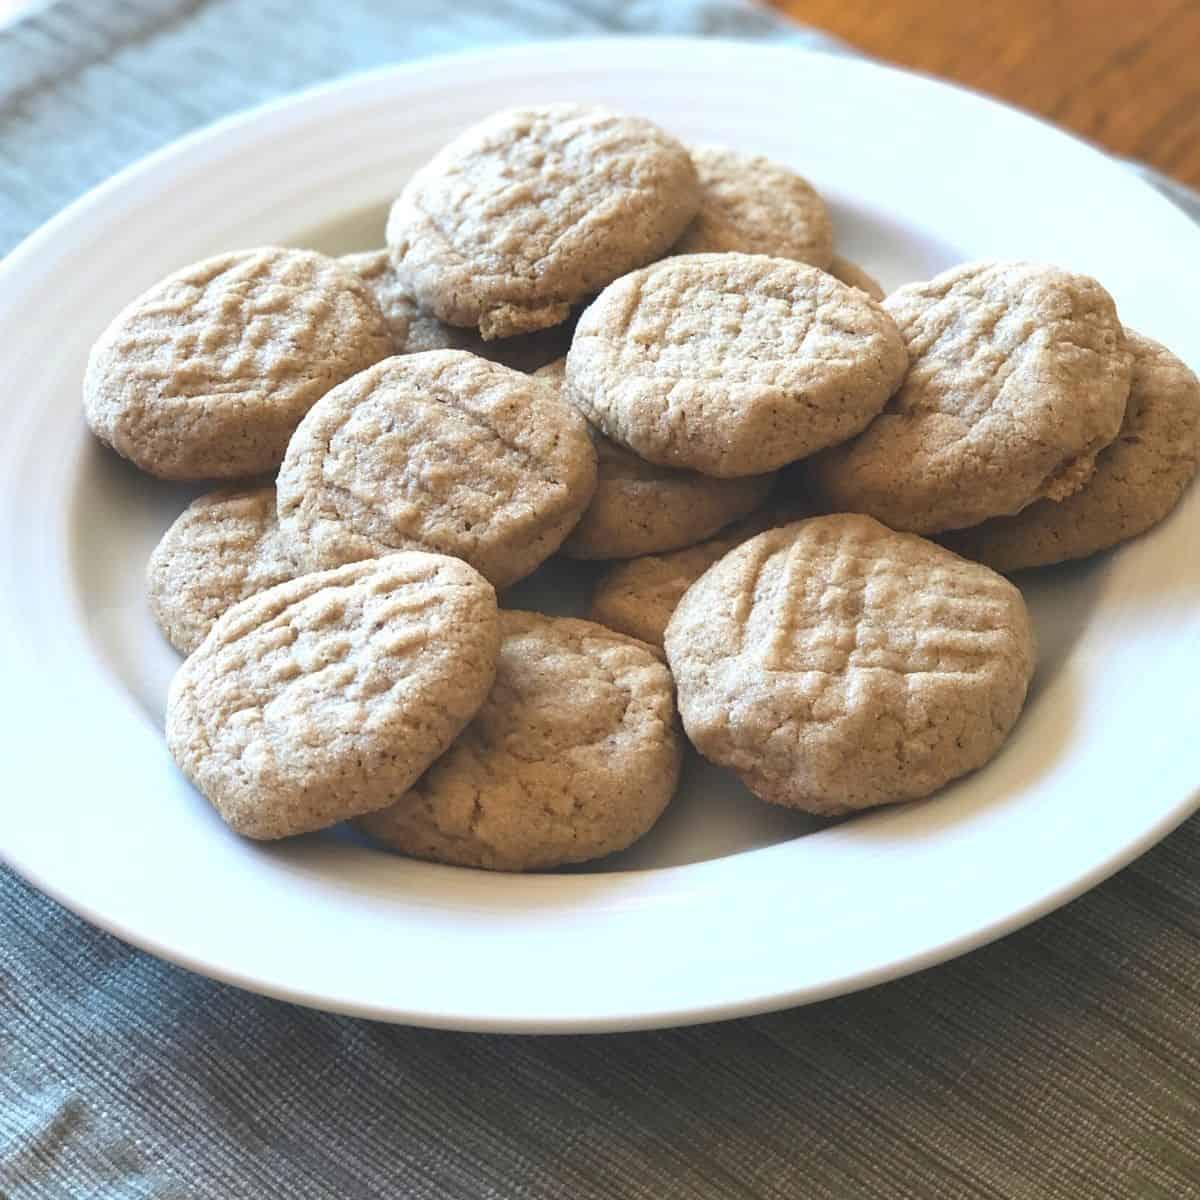 Sunbutter cookies on a plate